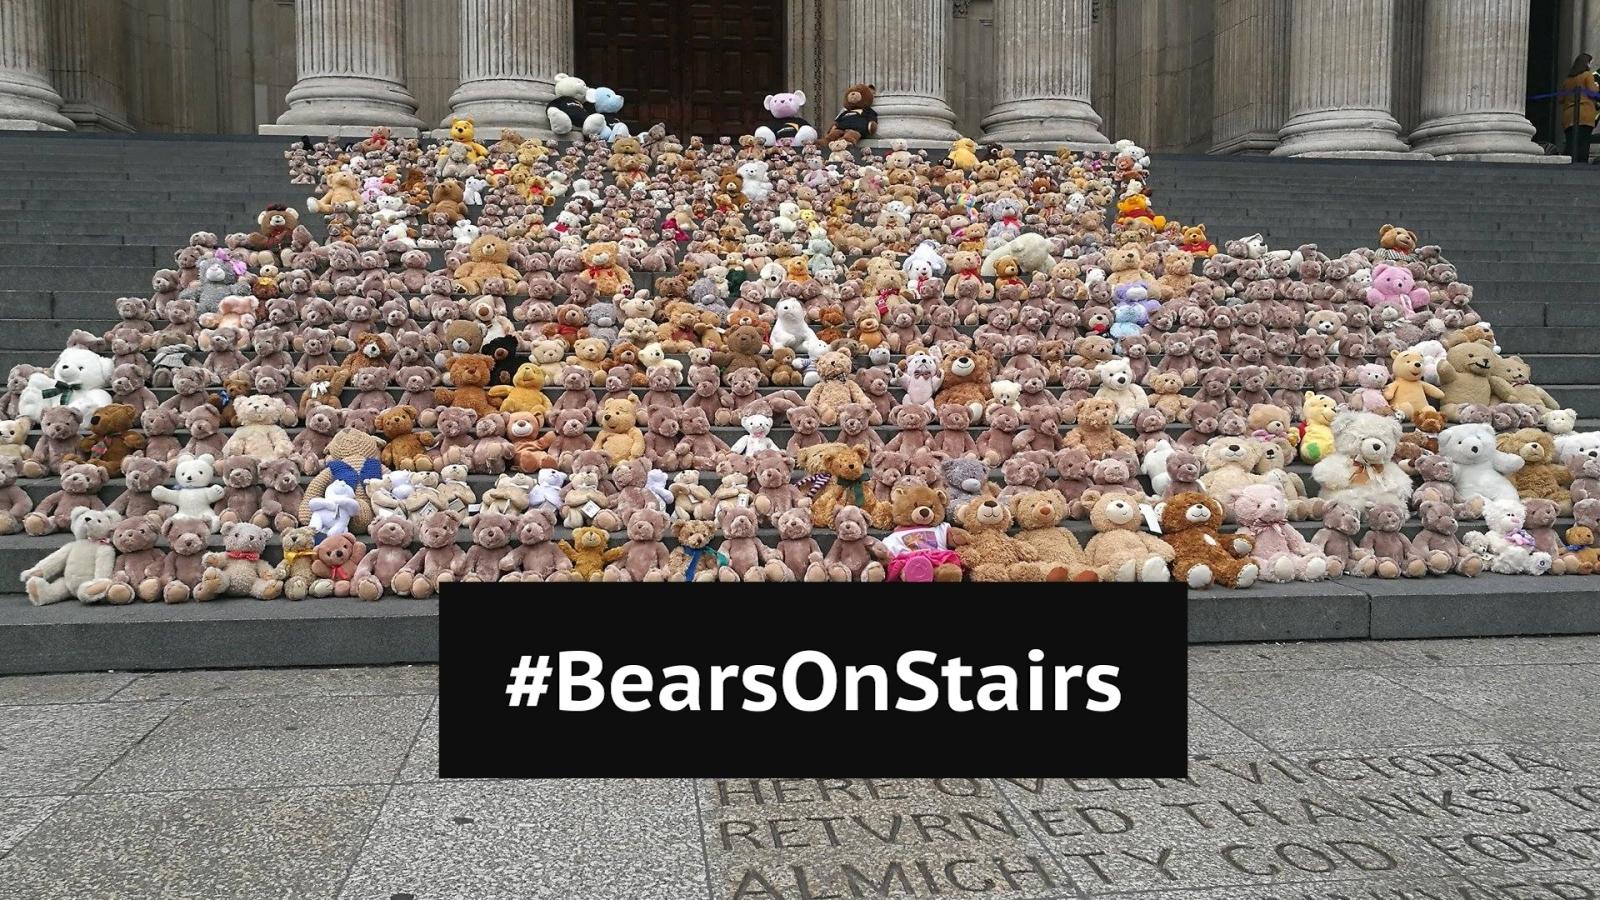 Bears on stairs